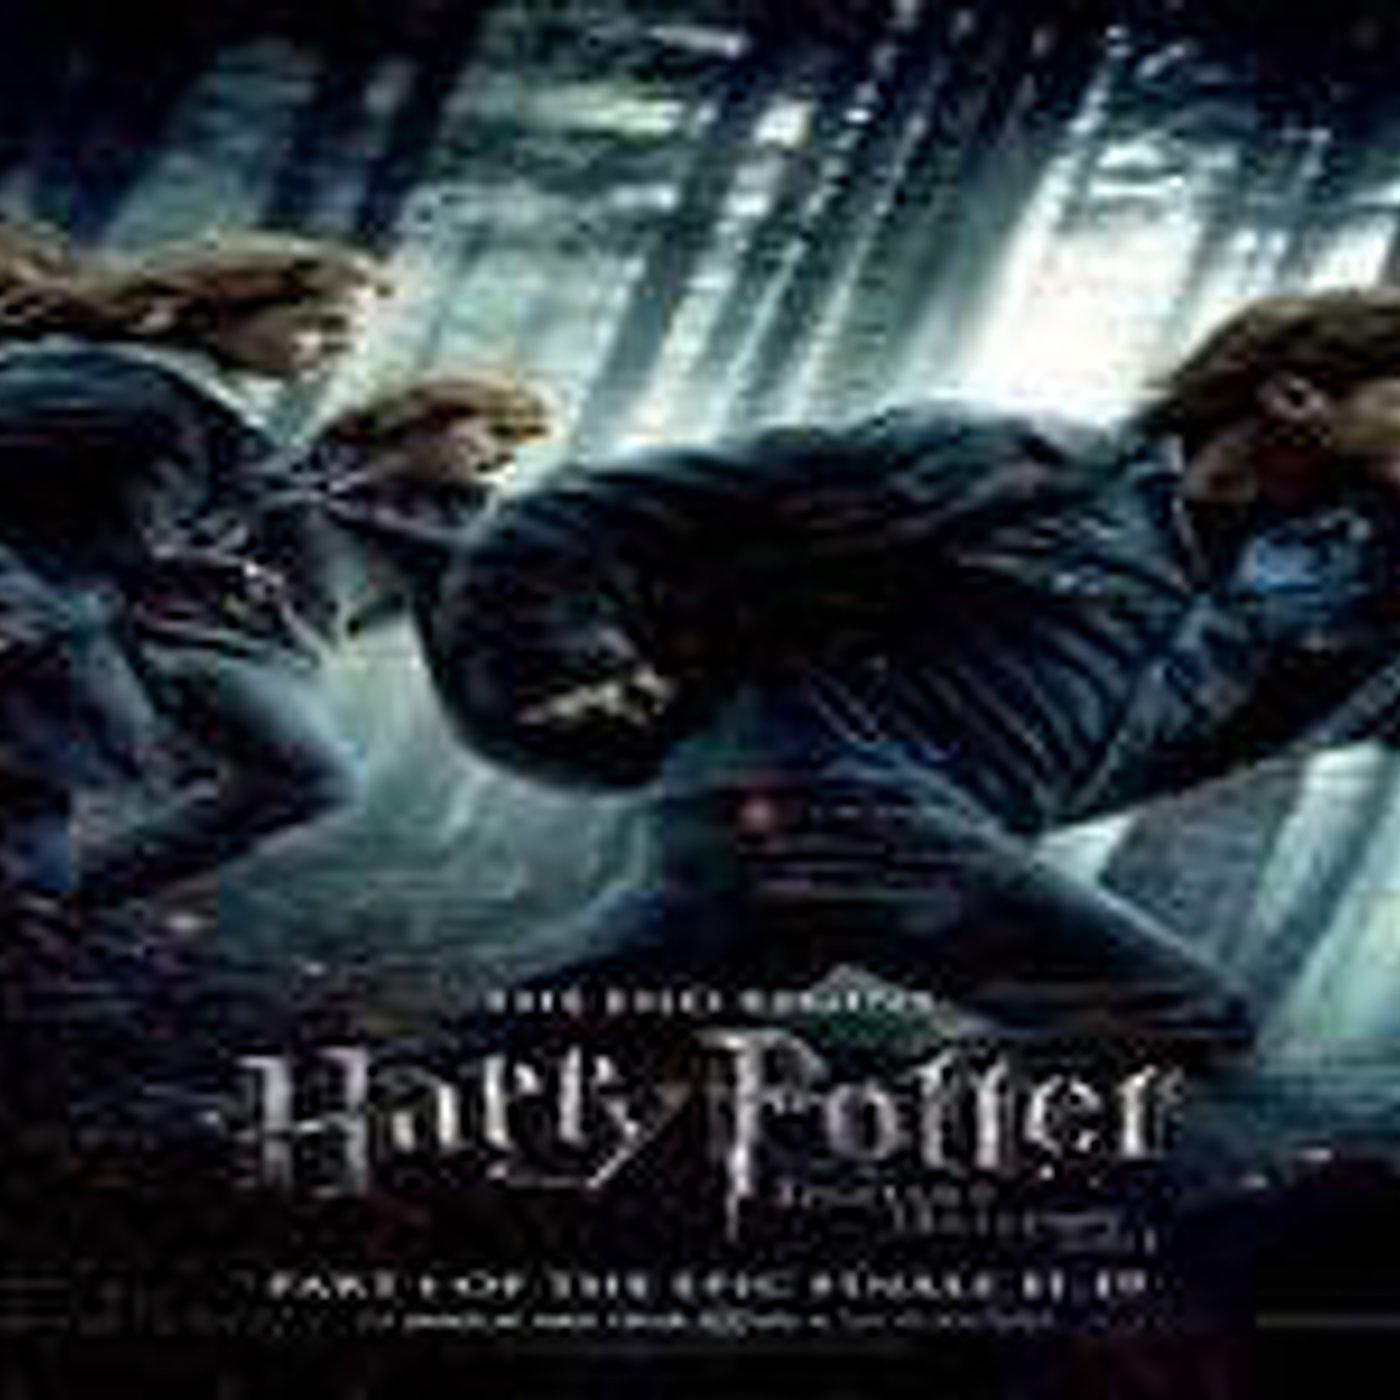 Harry Potter Y Las Reliquias De La Muerte 1ª Parte